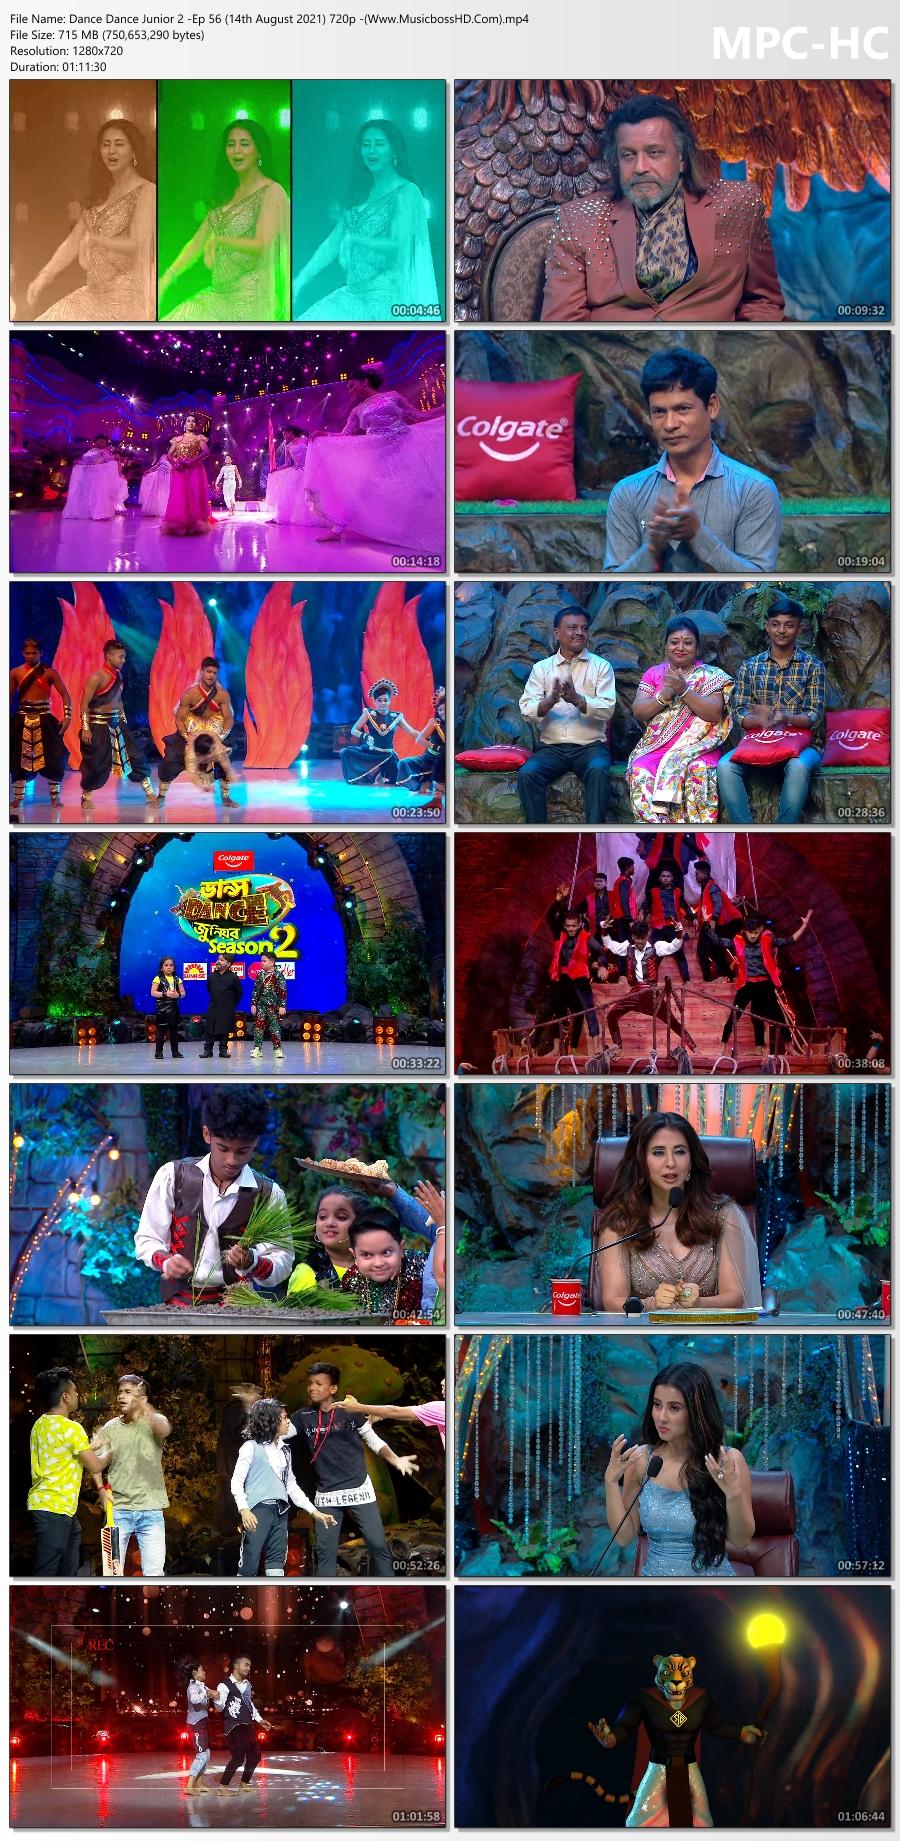 Dance-Dance-Junior-2-Ep-56-14th-August-2021-720p-Www-Musicboss-HD-Com-mp4-thumbs